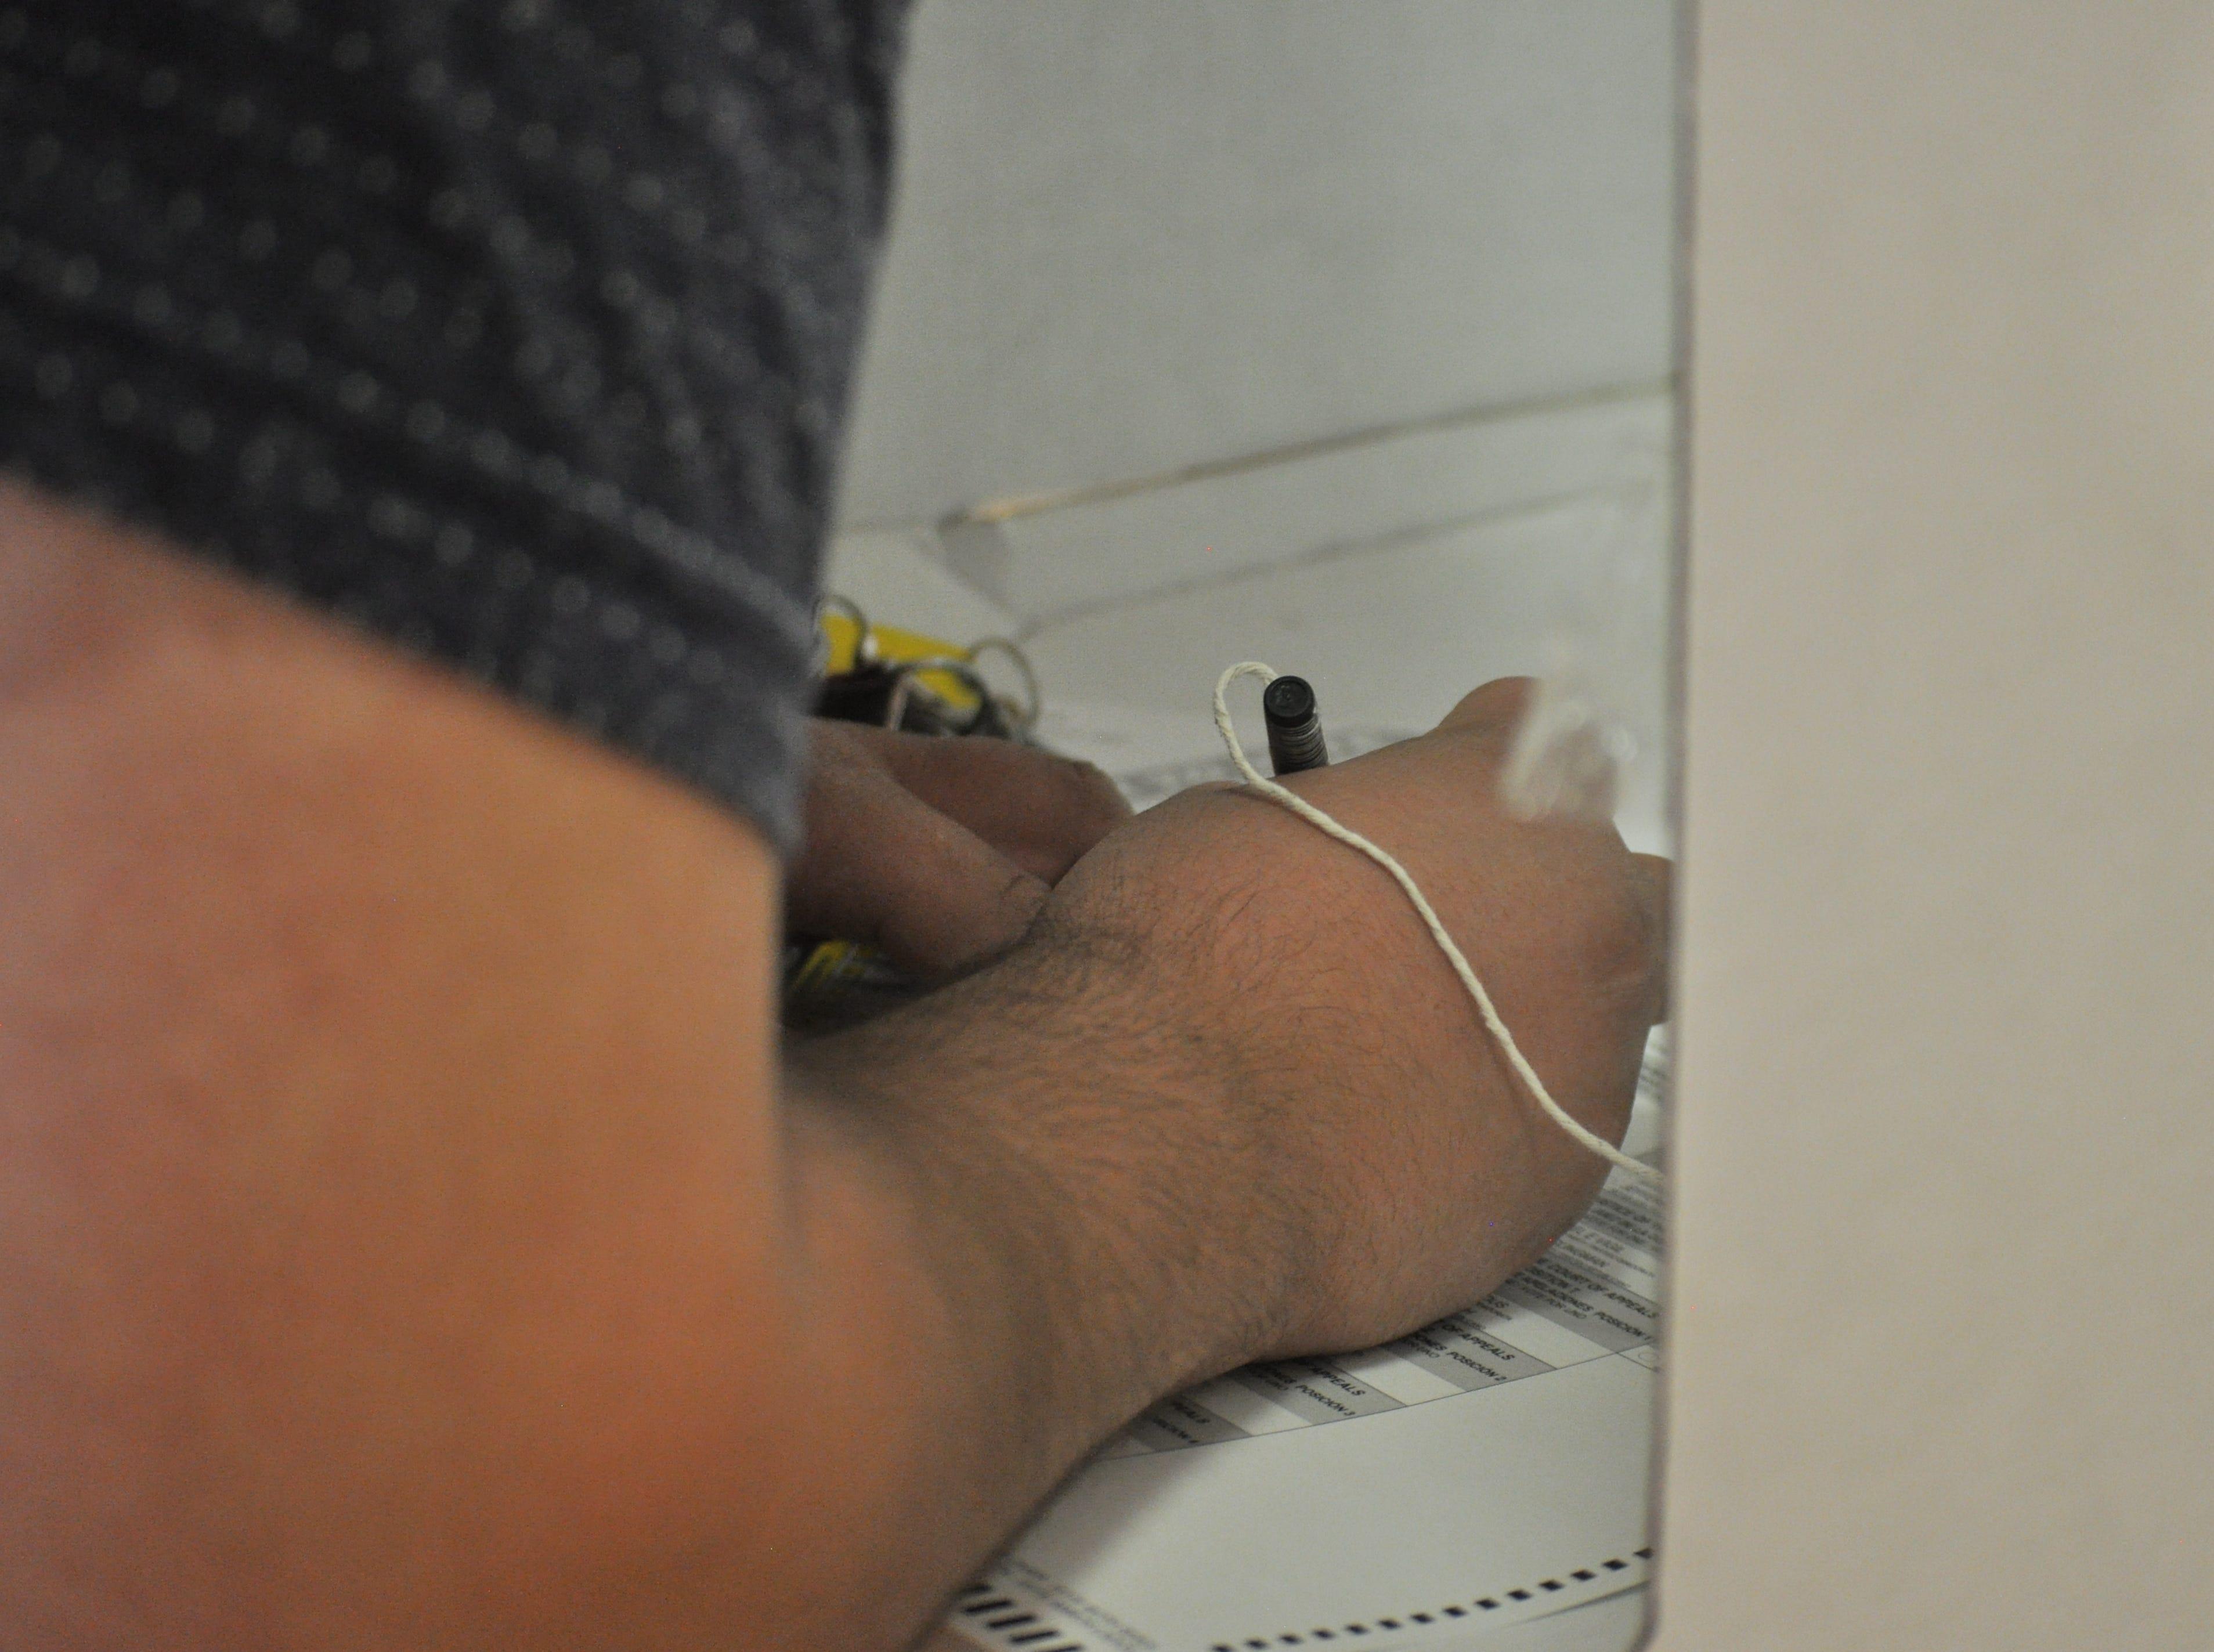 Salomon Soto casts his ballot, Nov. 6, 2018 at Jefferson Montessori Academy.